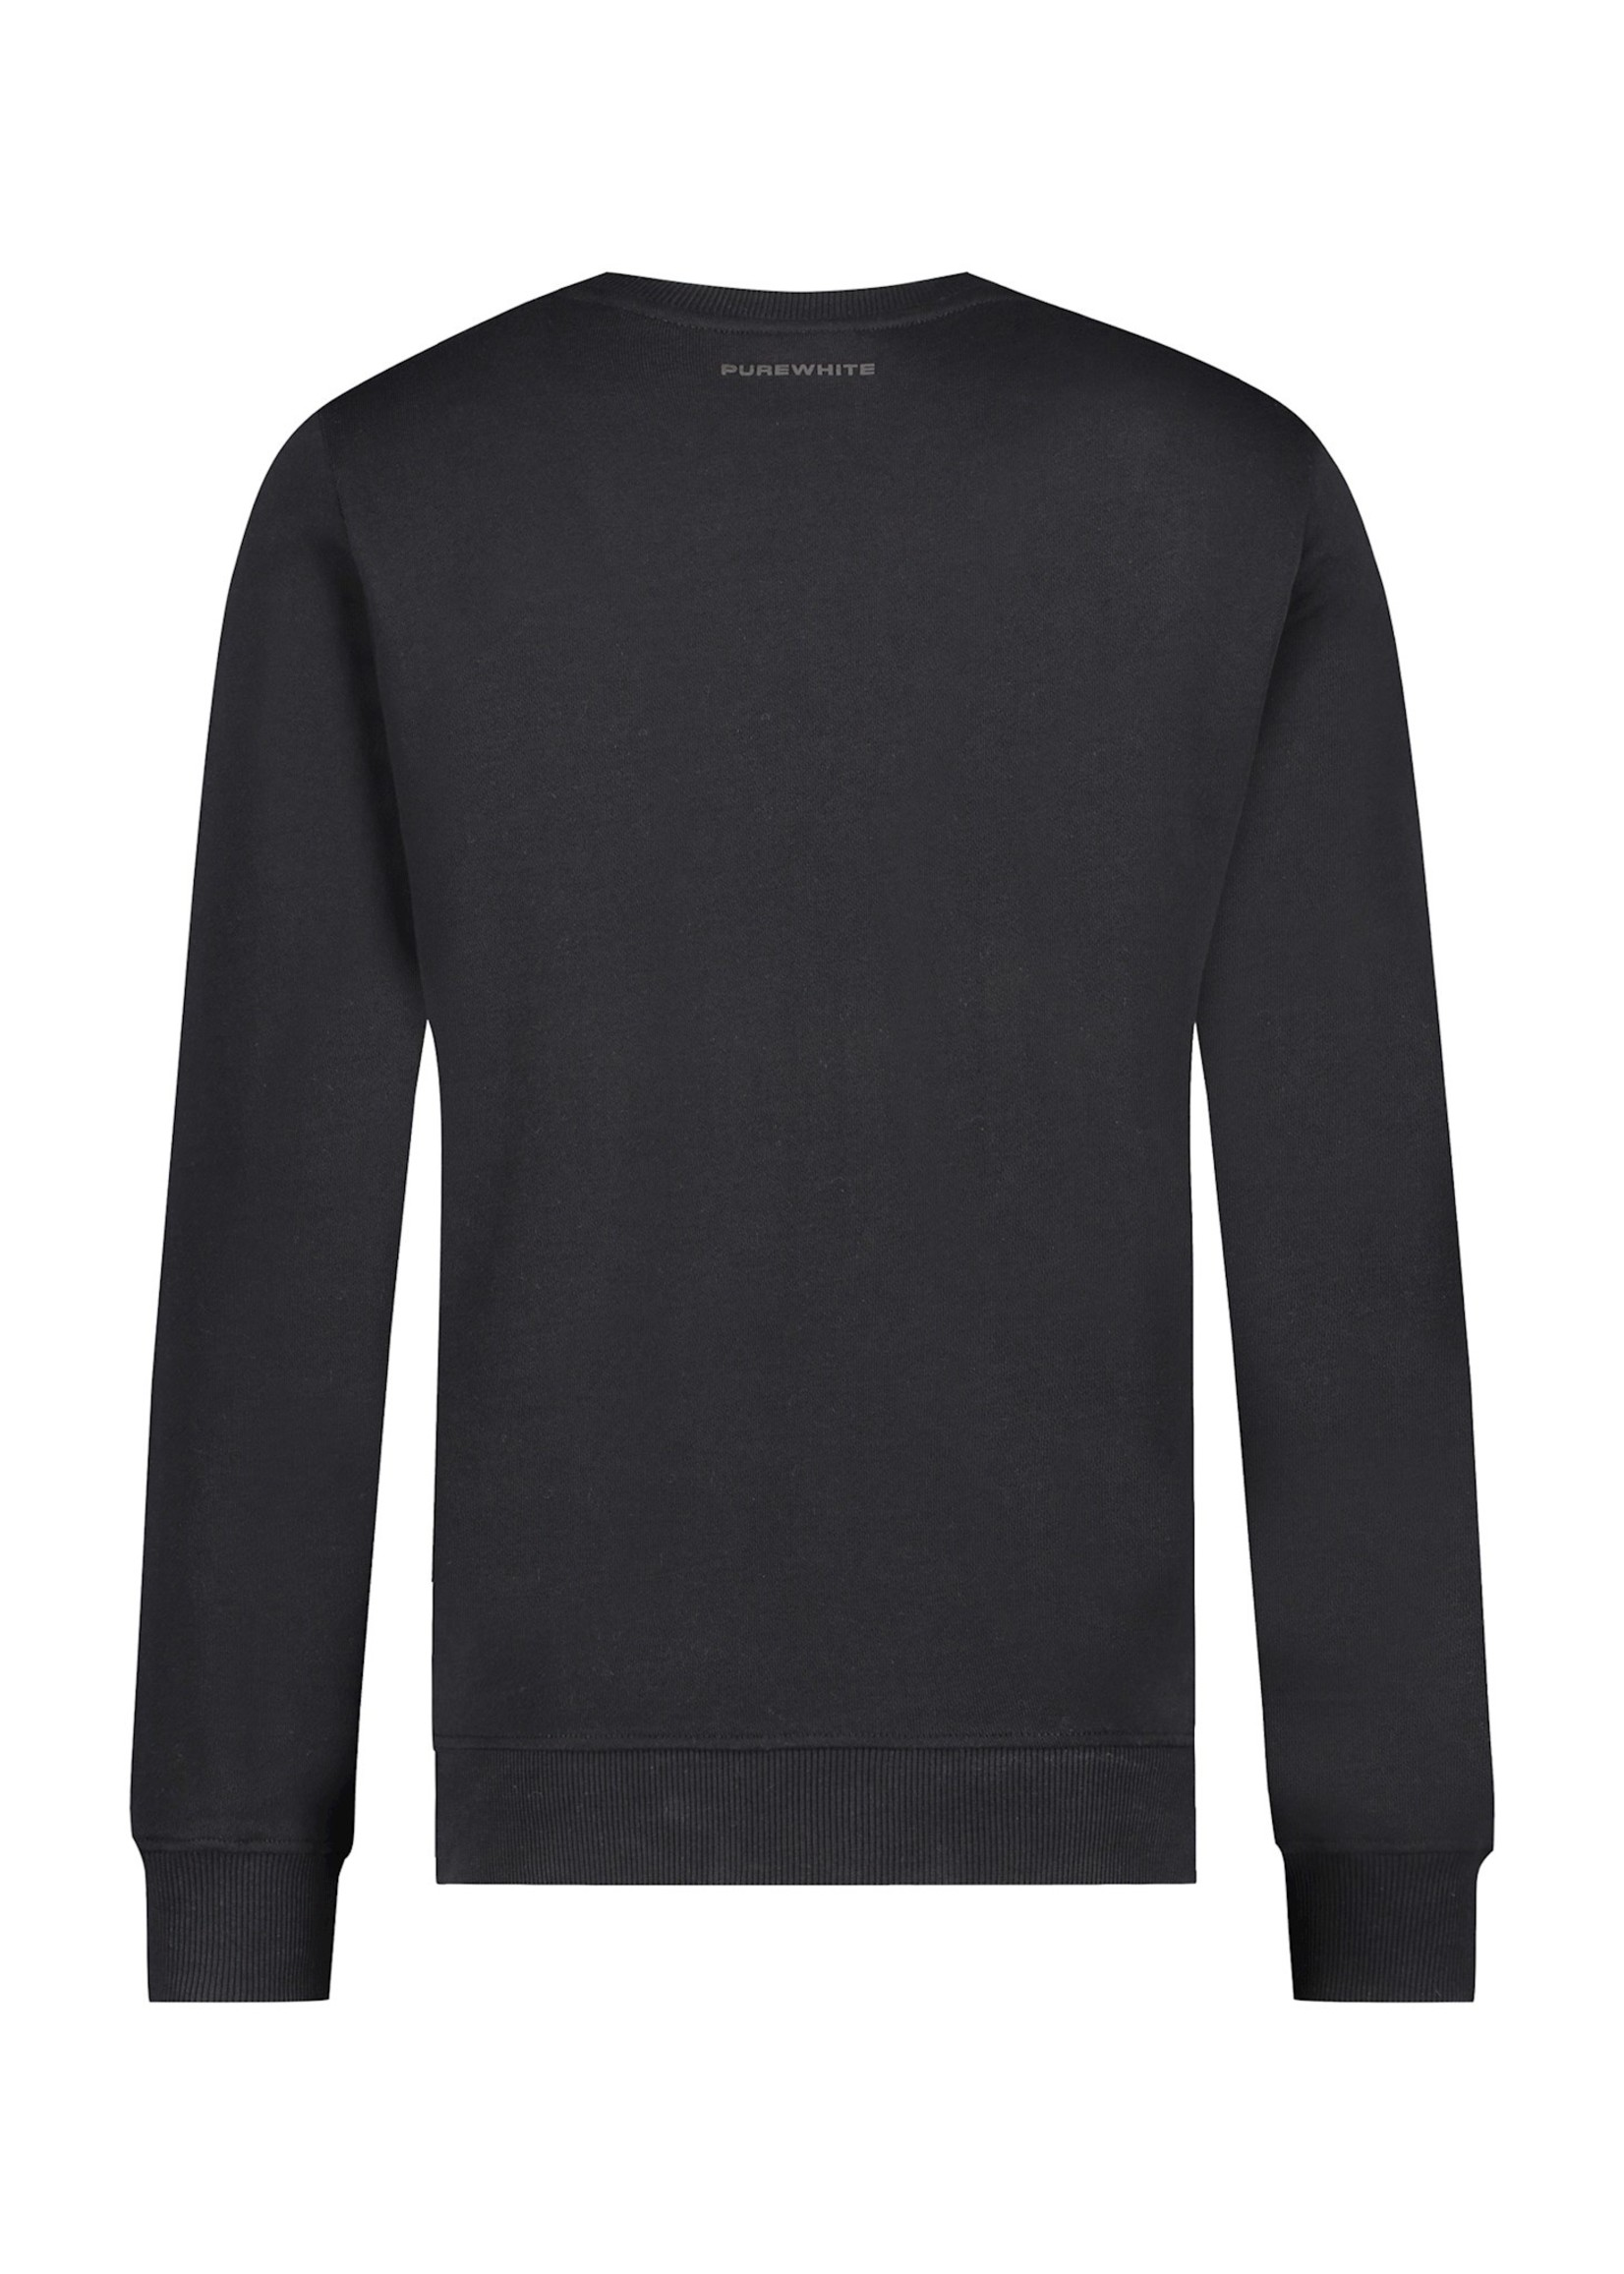 Purewhite Logo Stripe Sweater - Black